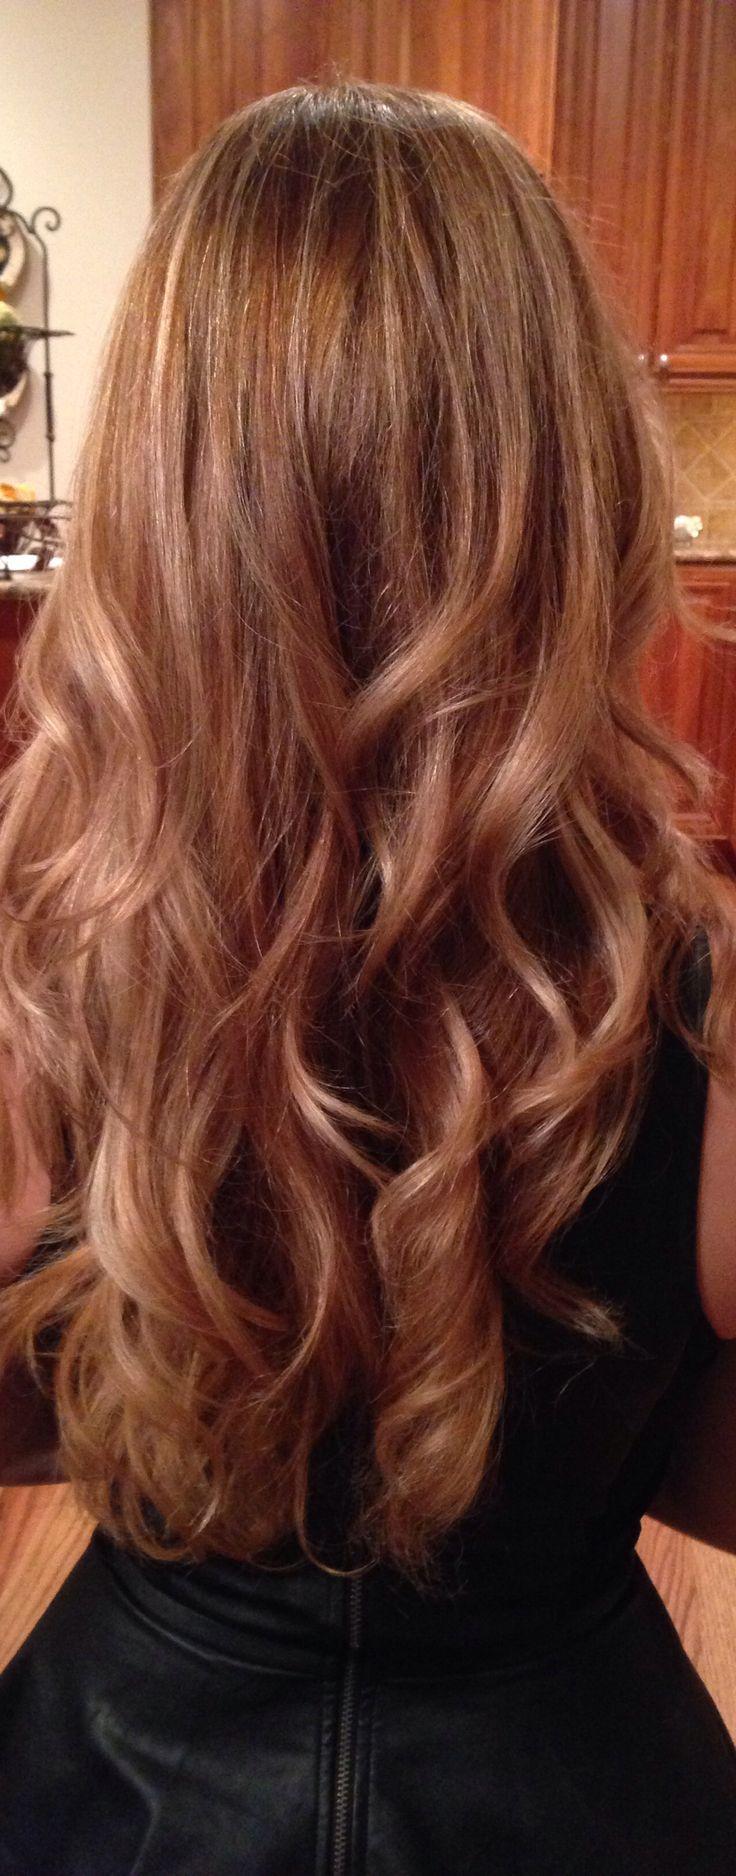 Carmel blonde hair. this actually might look good tooo